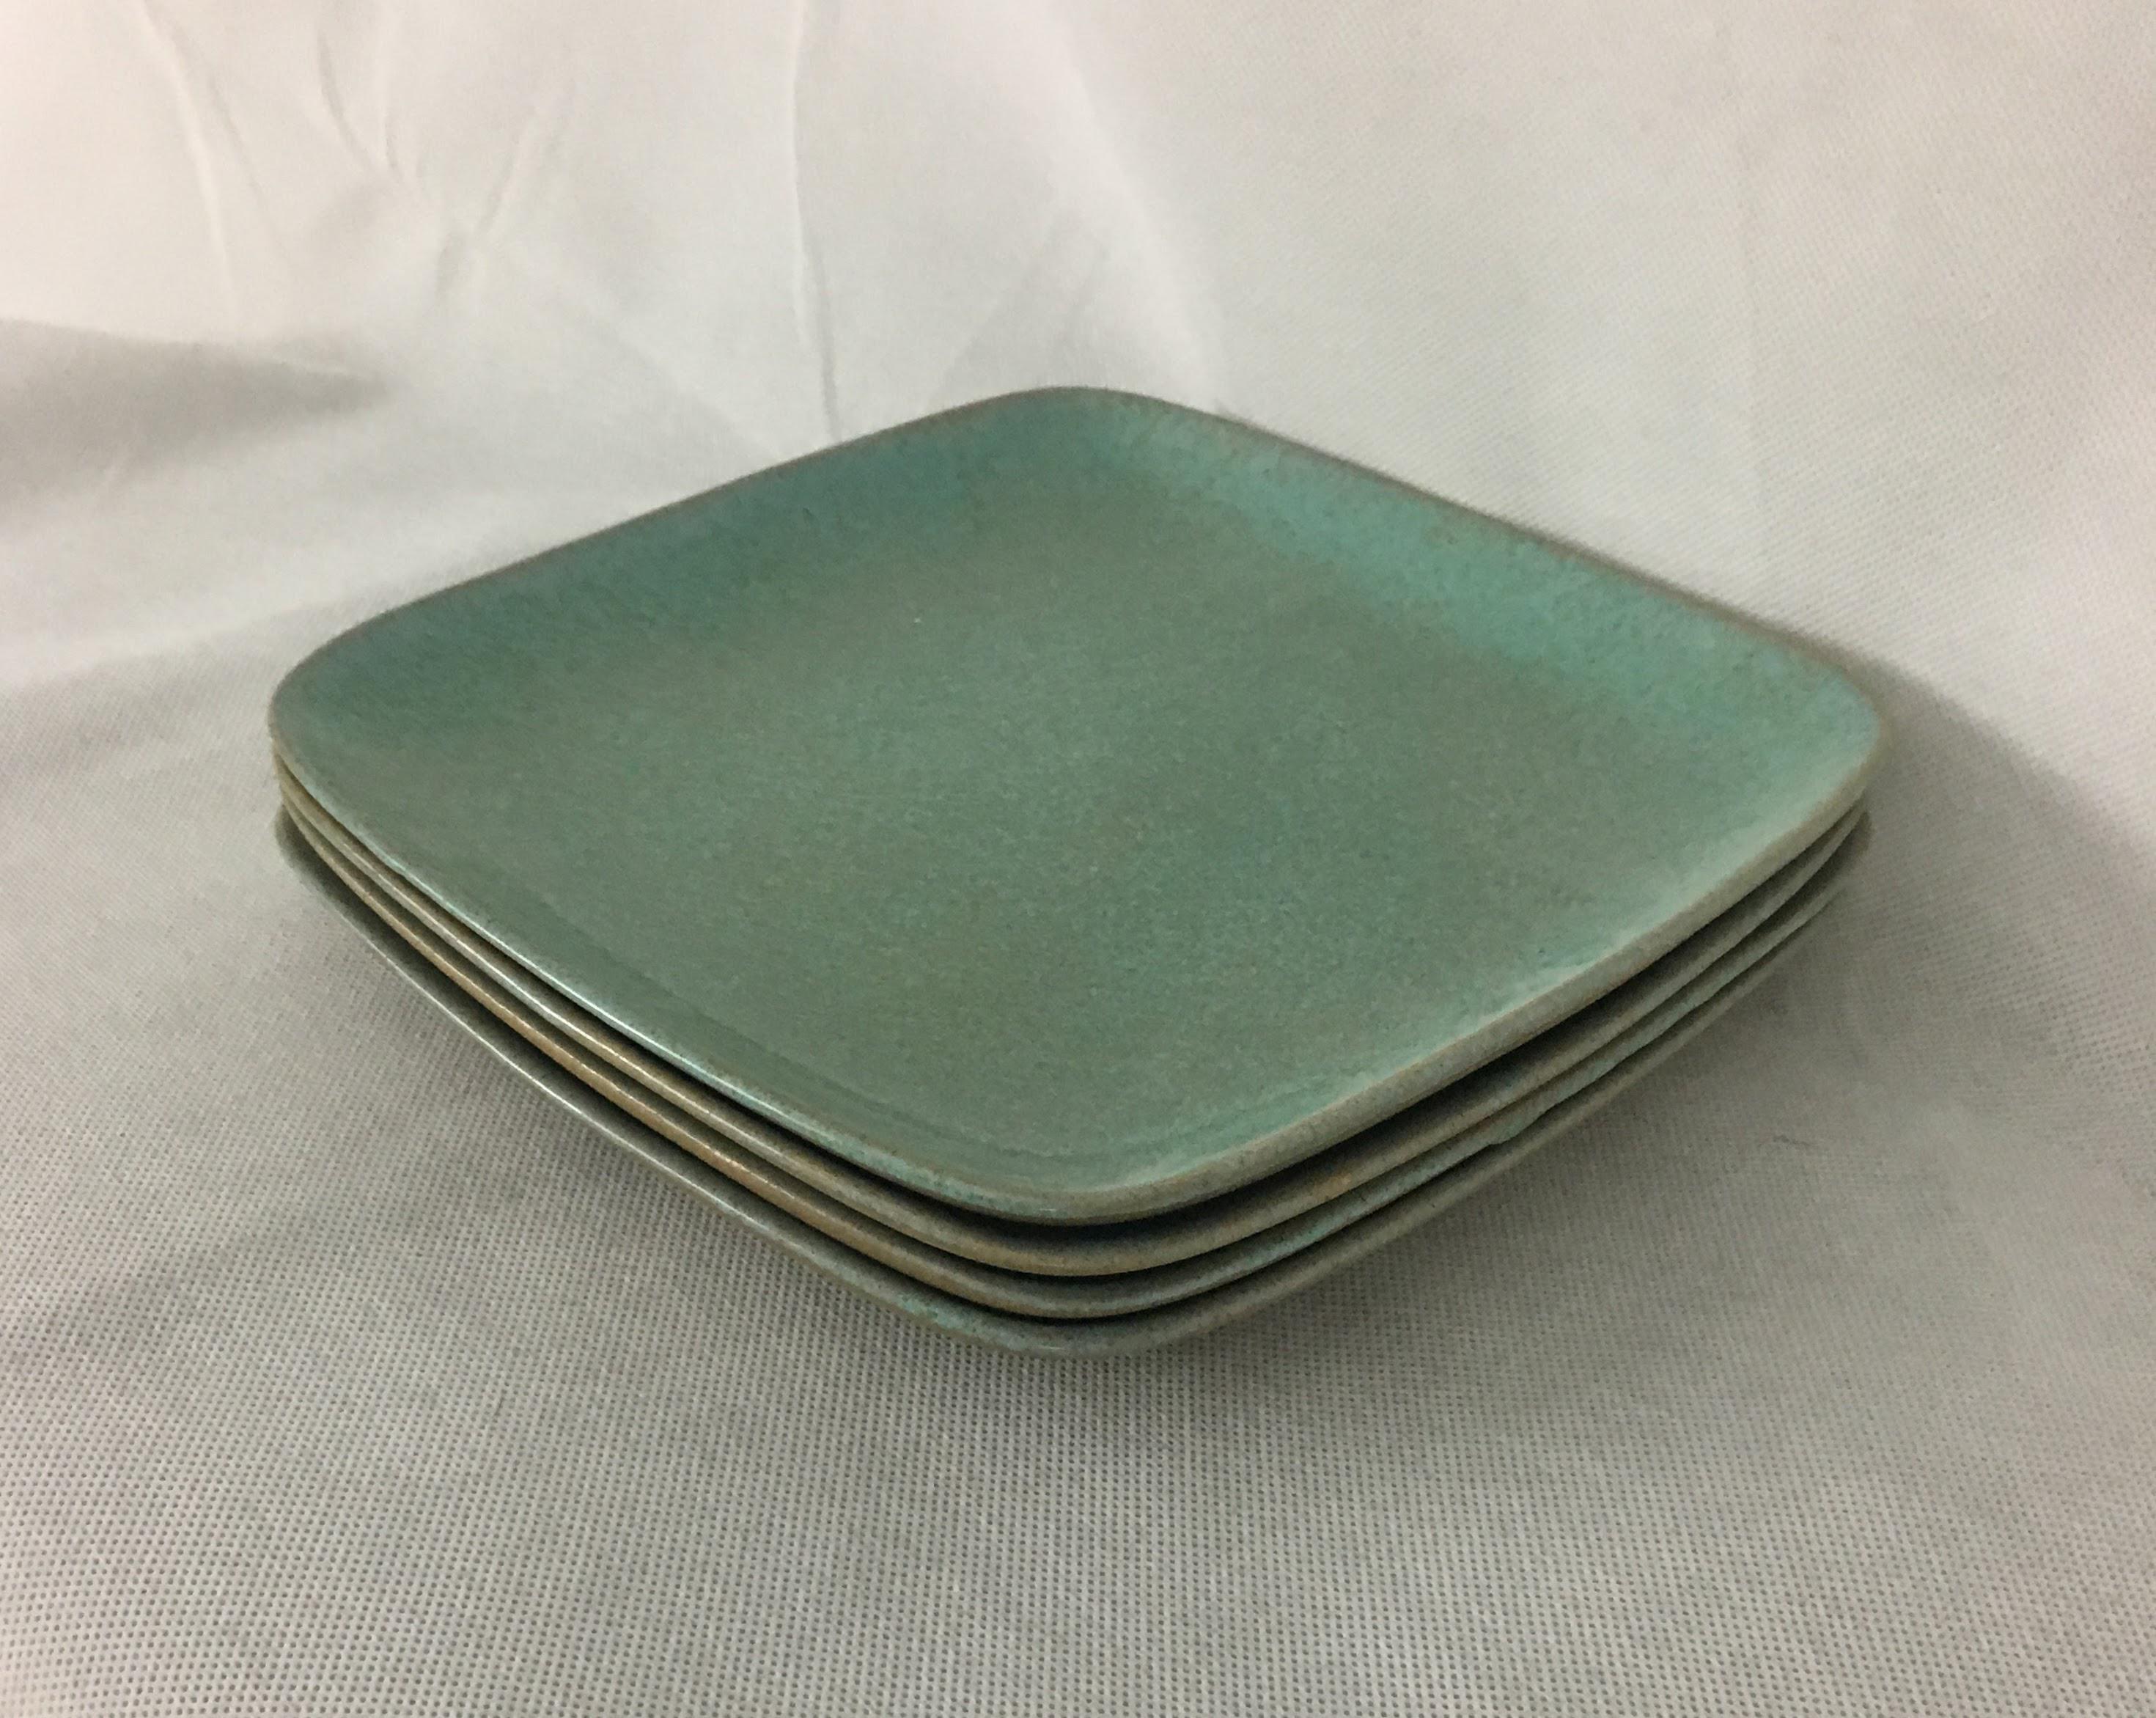 Glidden Matrix Turquoise Small Dinner Plates - Set of 4 - Image 5 of 5  sc 1 st  Chairish & Glidden Matrix Turquoise Small Dinner Plates - Set of 4   Chairish